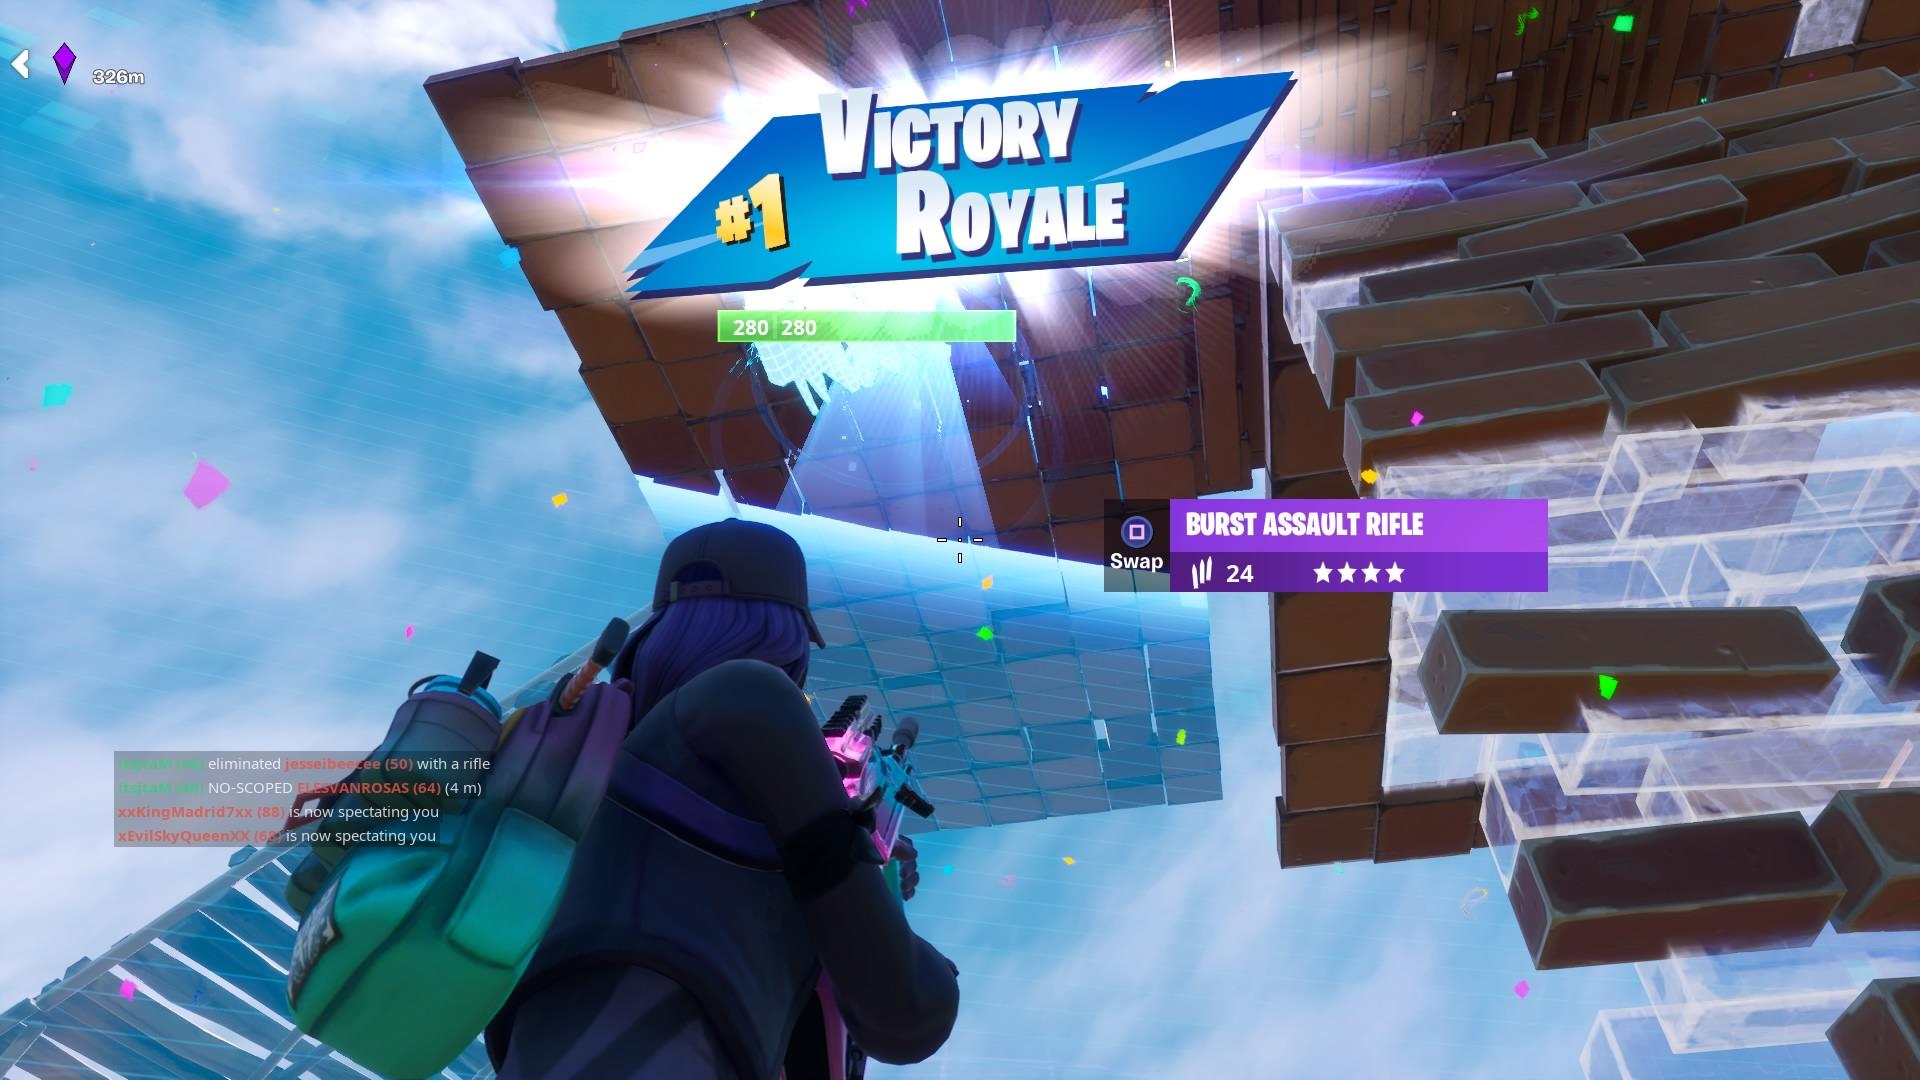 fortnite victory 71189